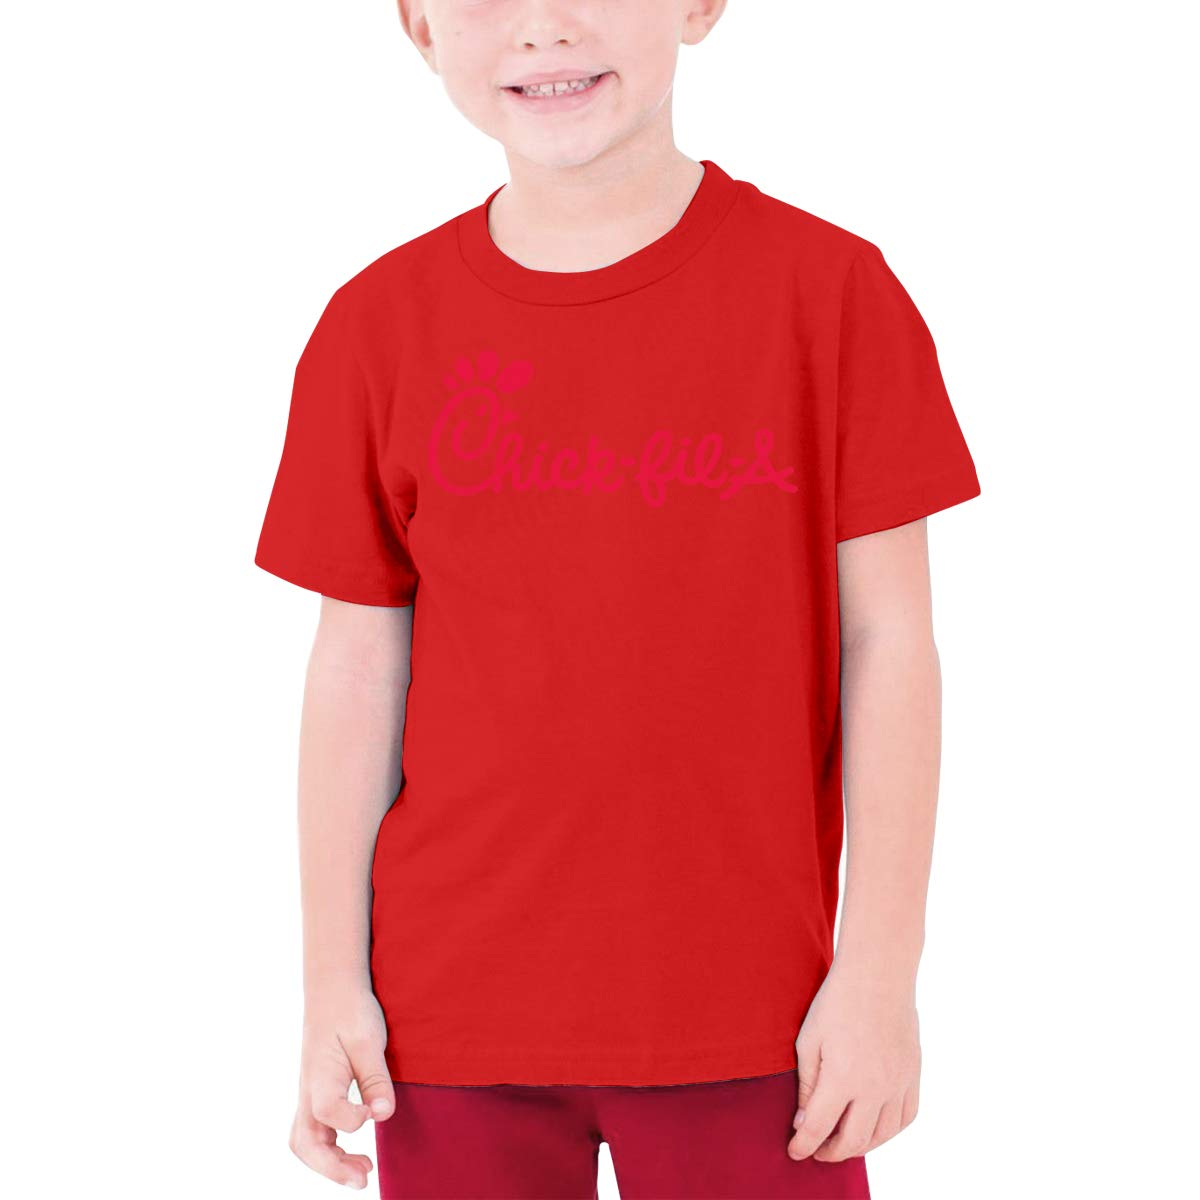 Youth Graphic Tshirts Teenage Boys Girls Short Sleeve T-Shirt Chick-fil-A Logo Printed Round Collar T Shirt Tees Tops